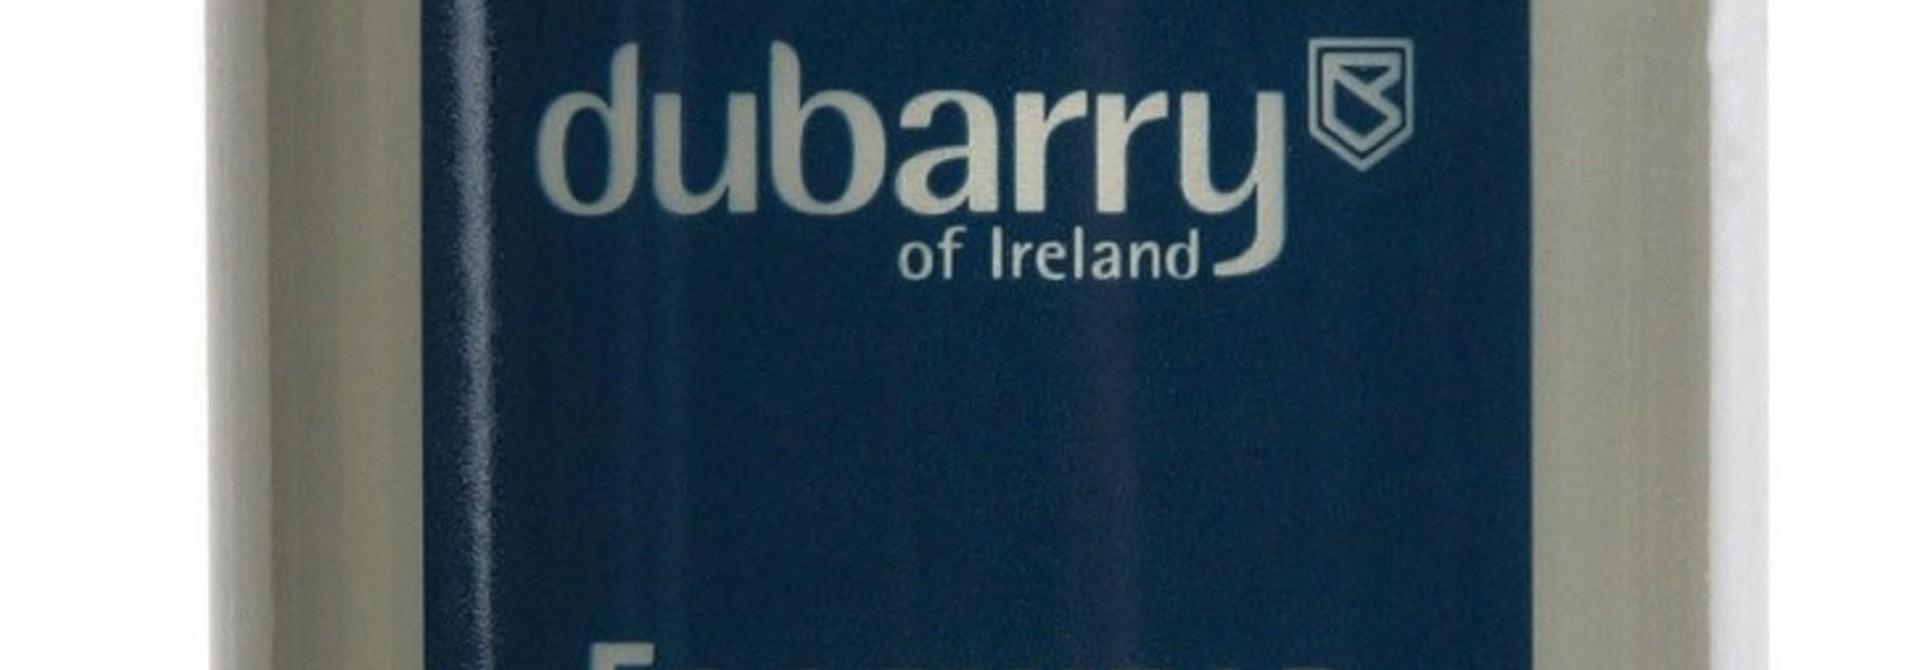 Dubarry Cleaner